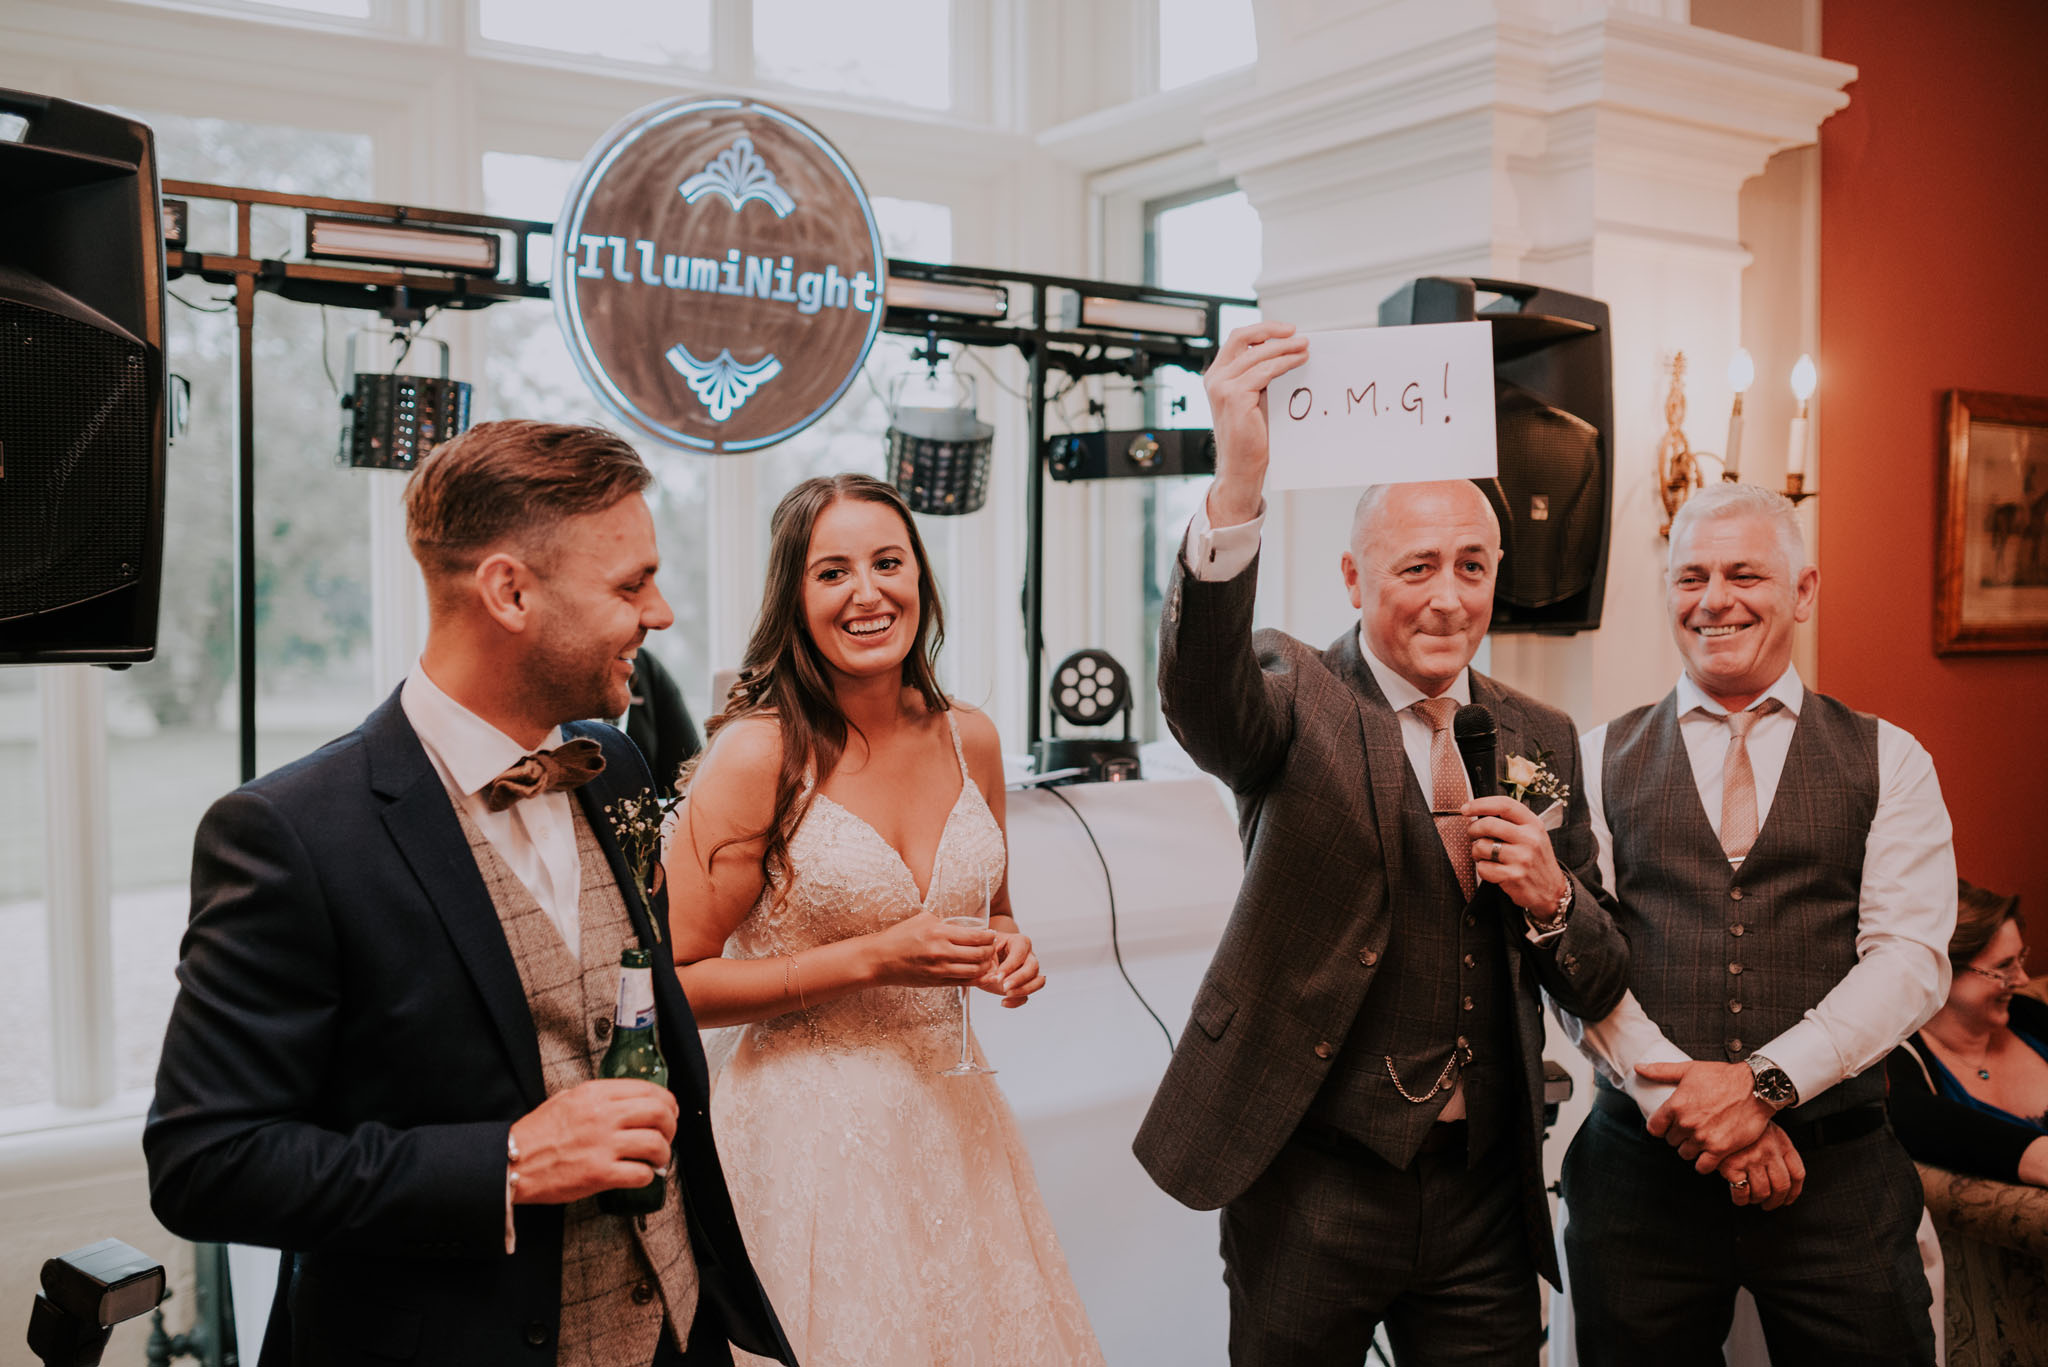 wedding-photographer-glewstone-court-hereford-scott-stockwell-photography416.jpg